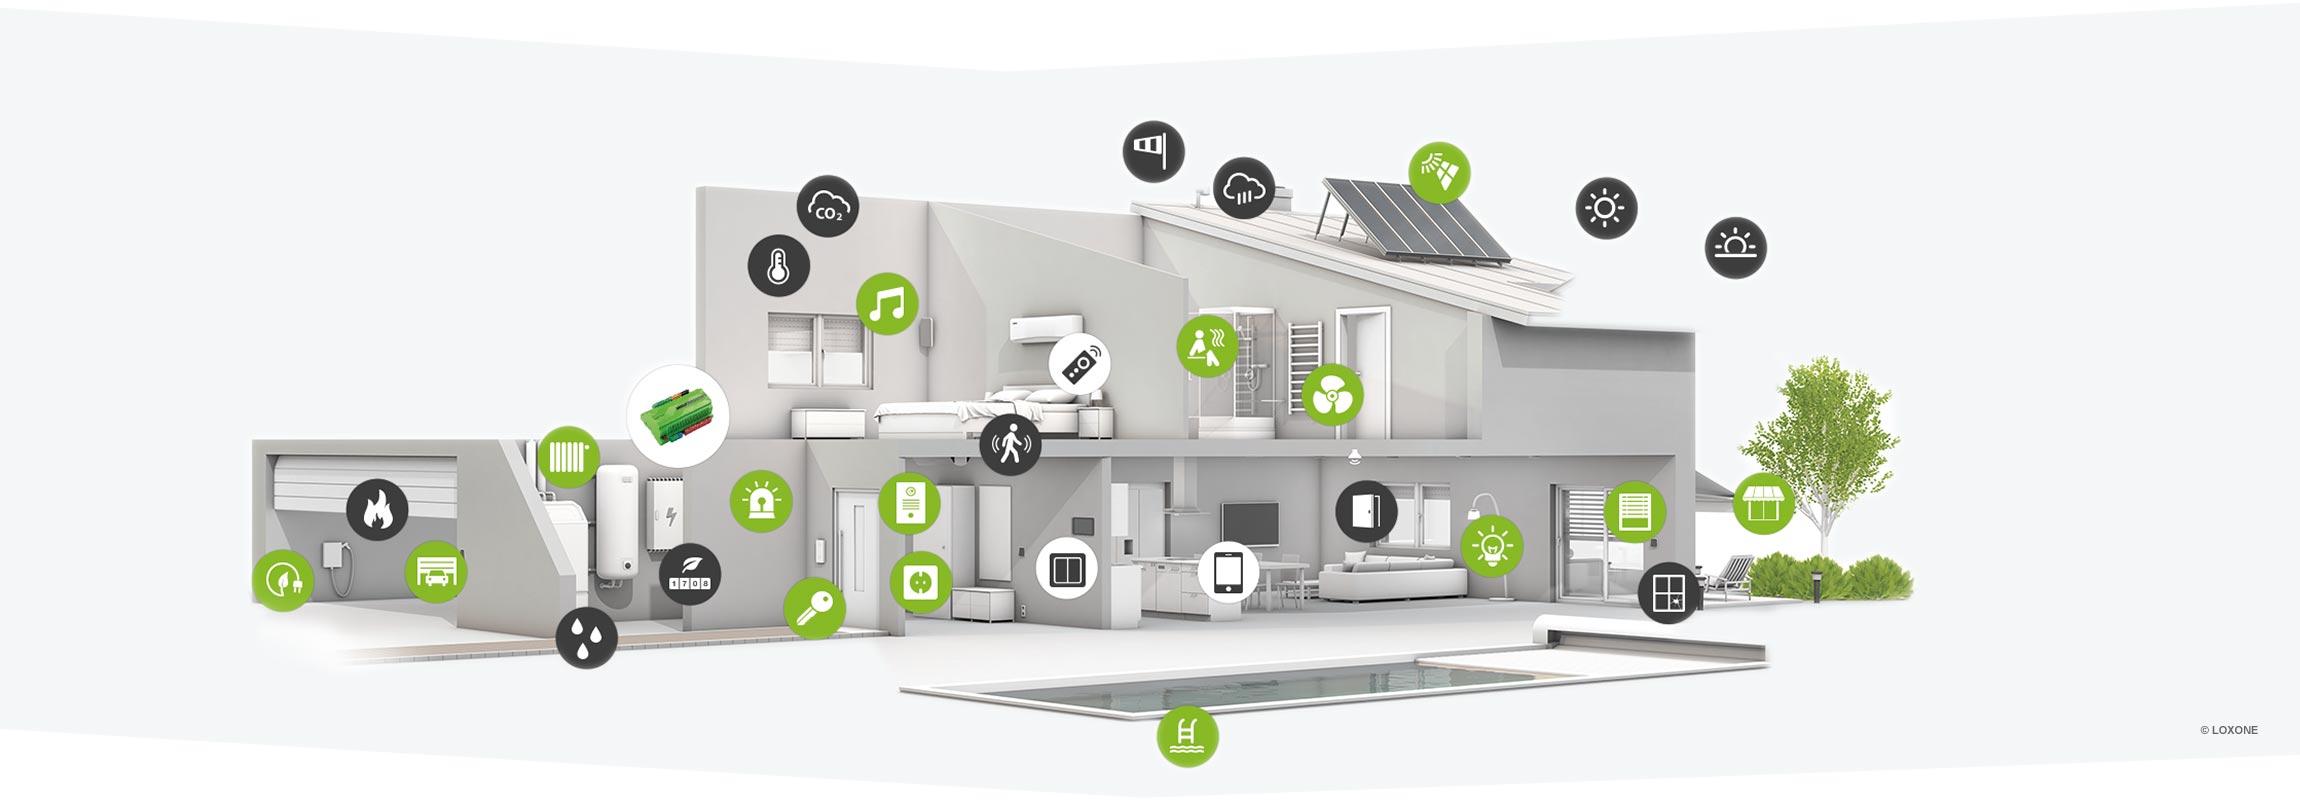 Elektro Taubert Nürnberg | Ihr Elektriker | Smart Home ...